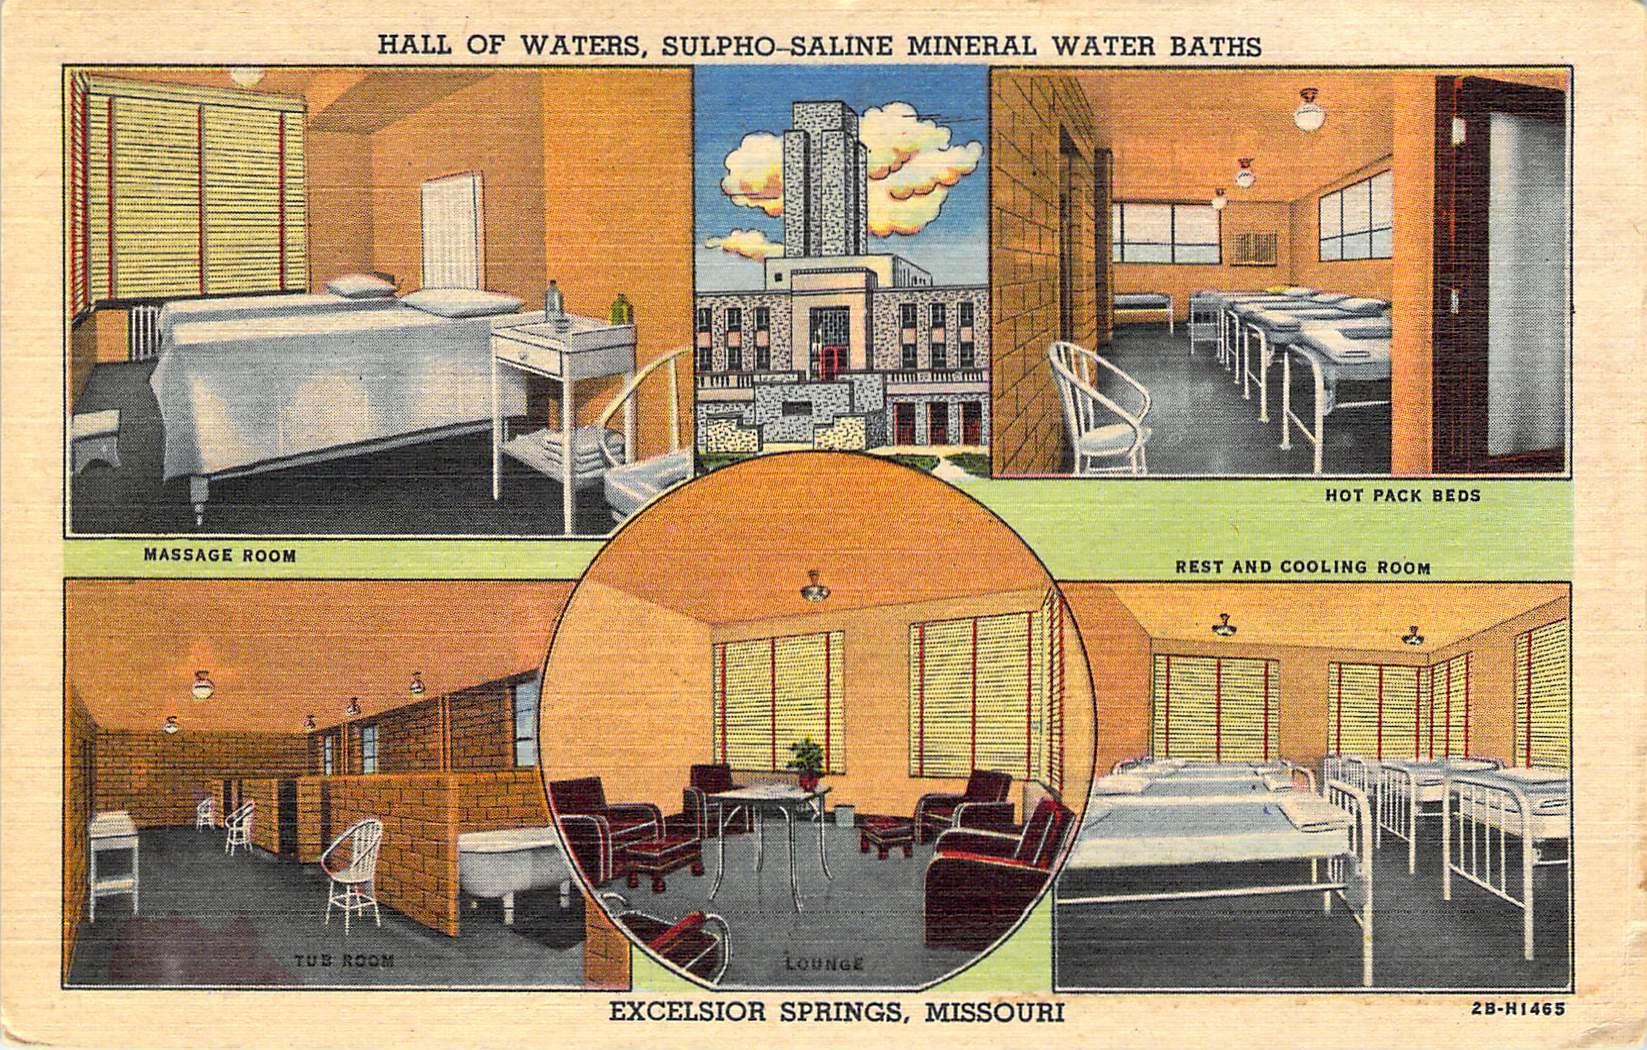 Missouri, MO, Excelsior Springs, Siloam Spring 1908